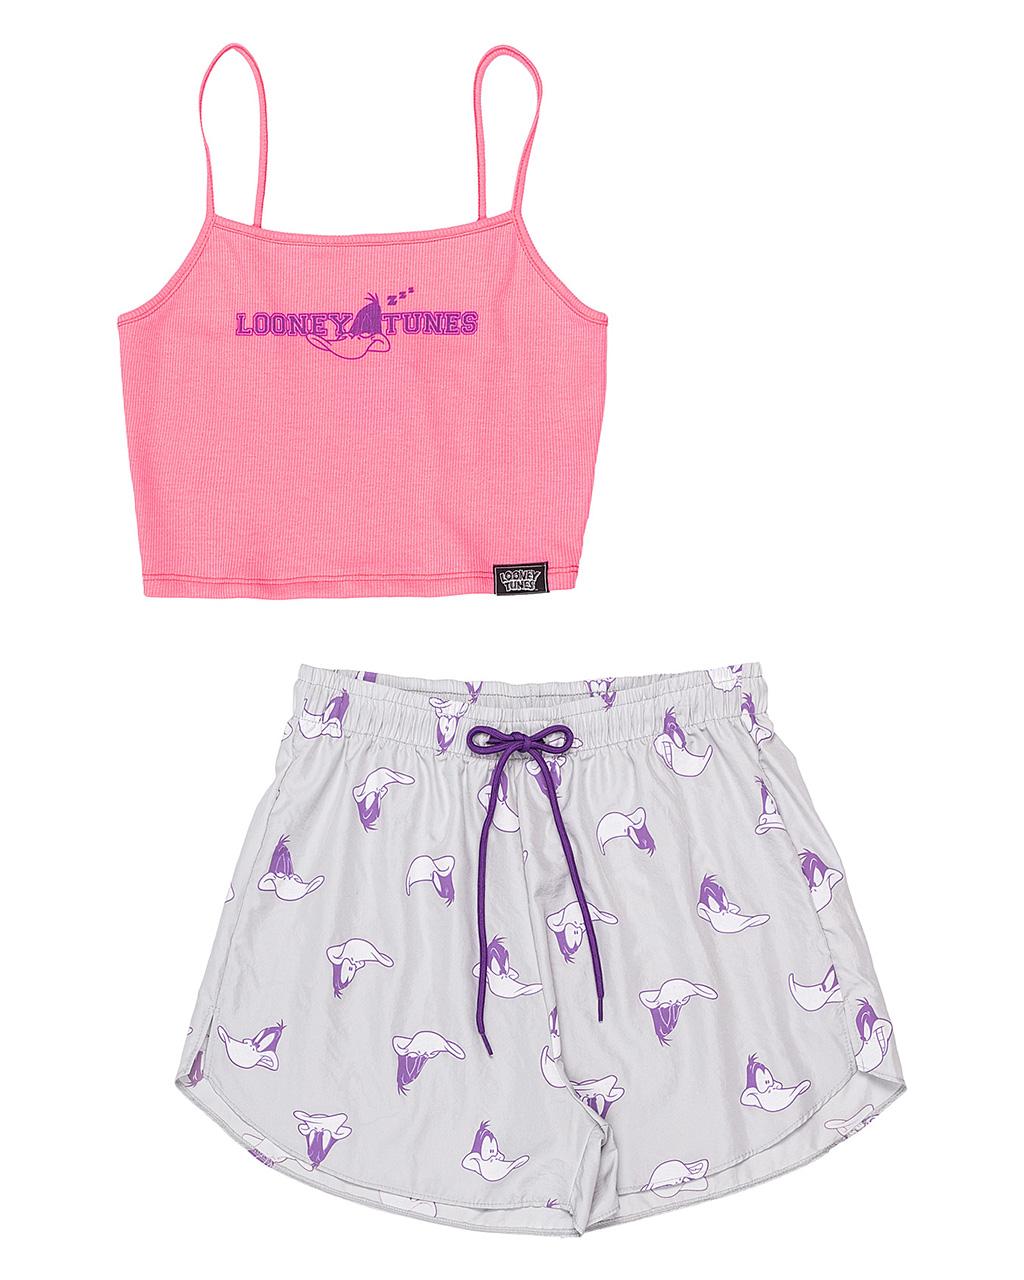 Conjunto Pijama Teen Top e Shorts Rosa Authoria